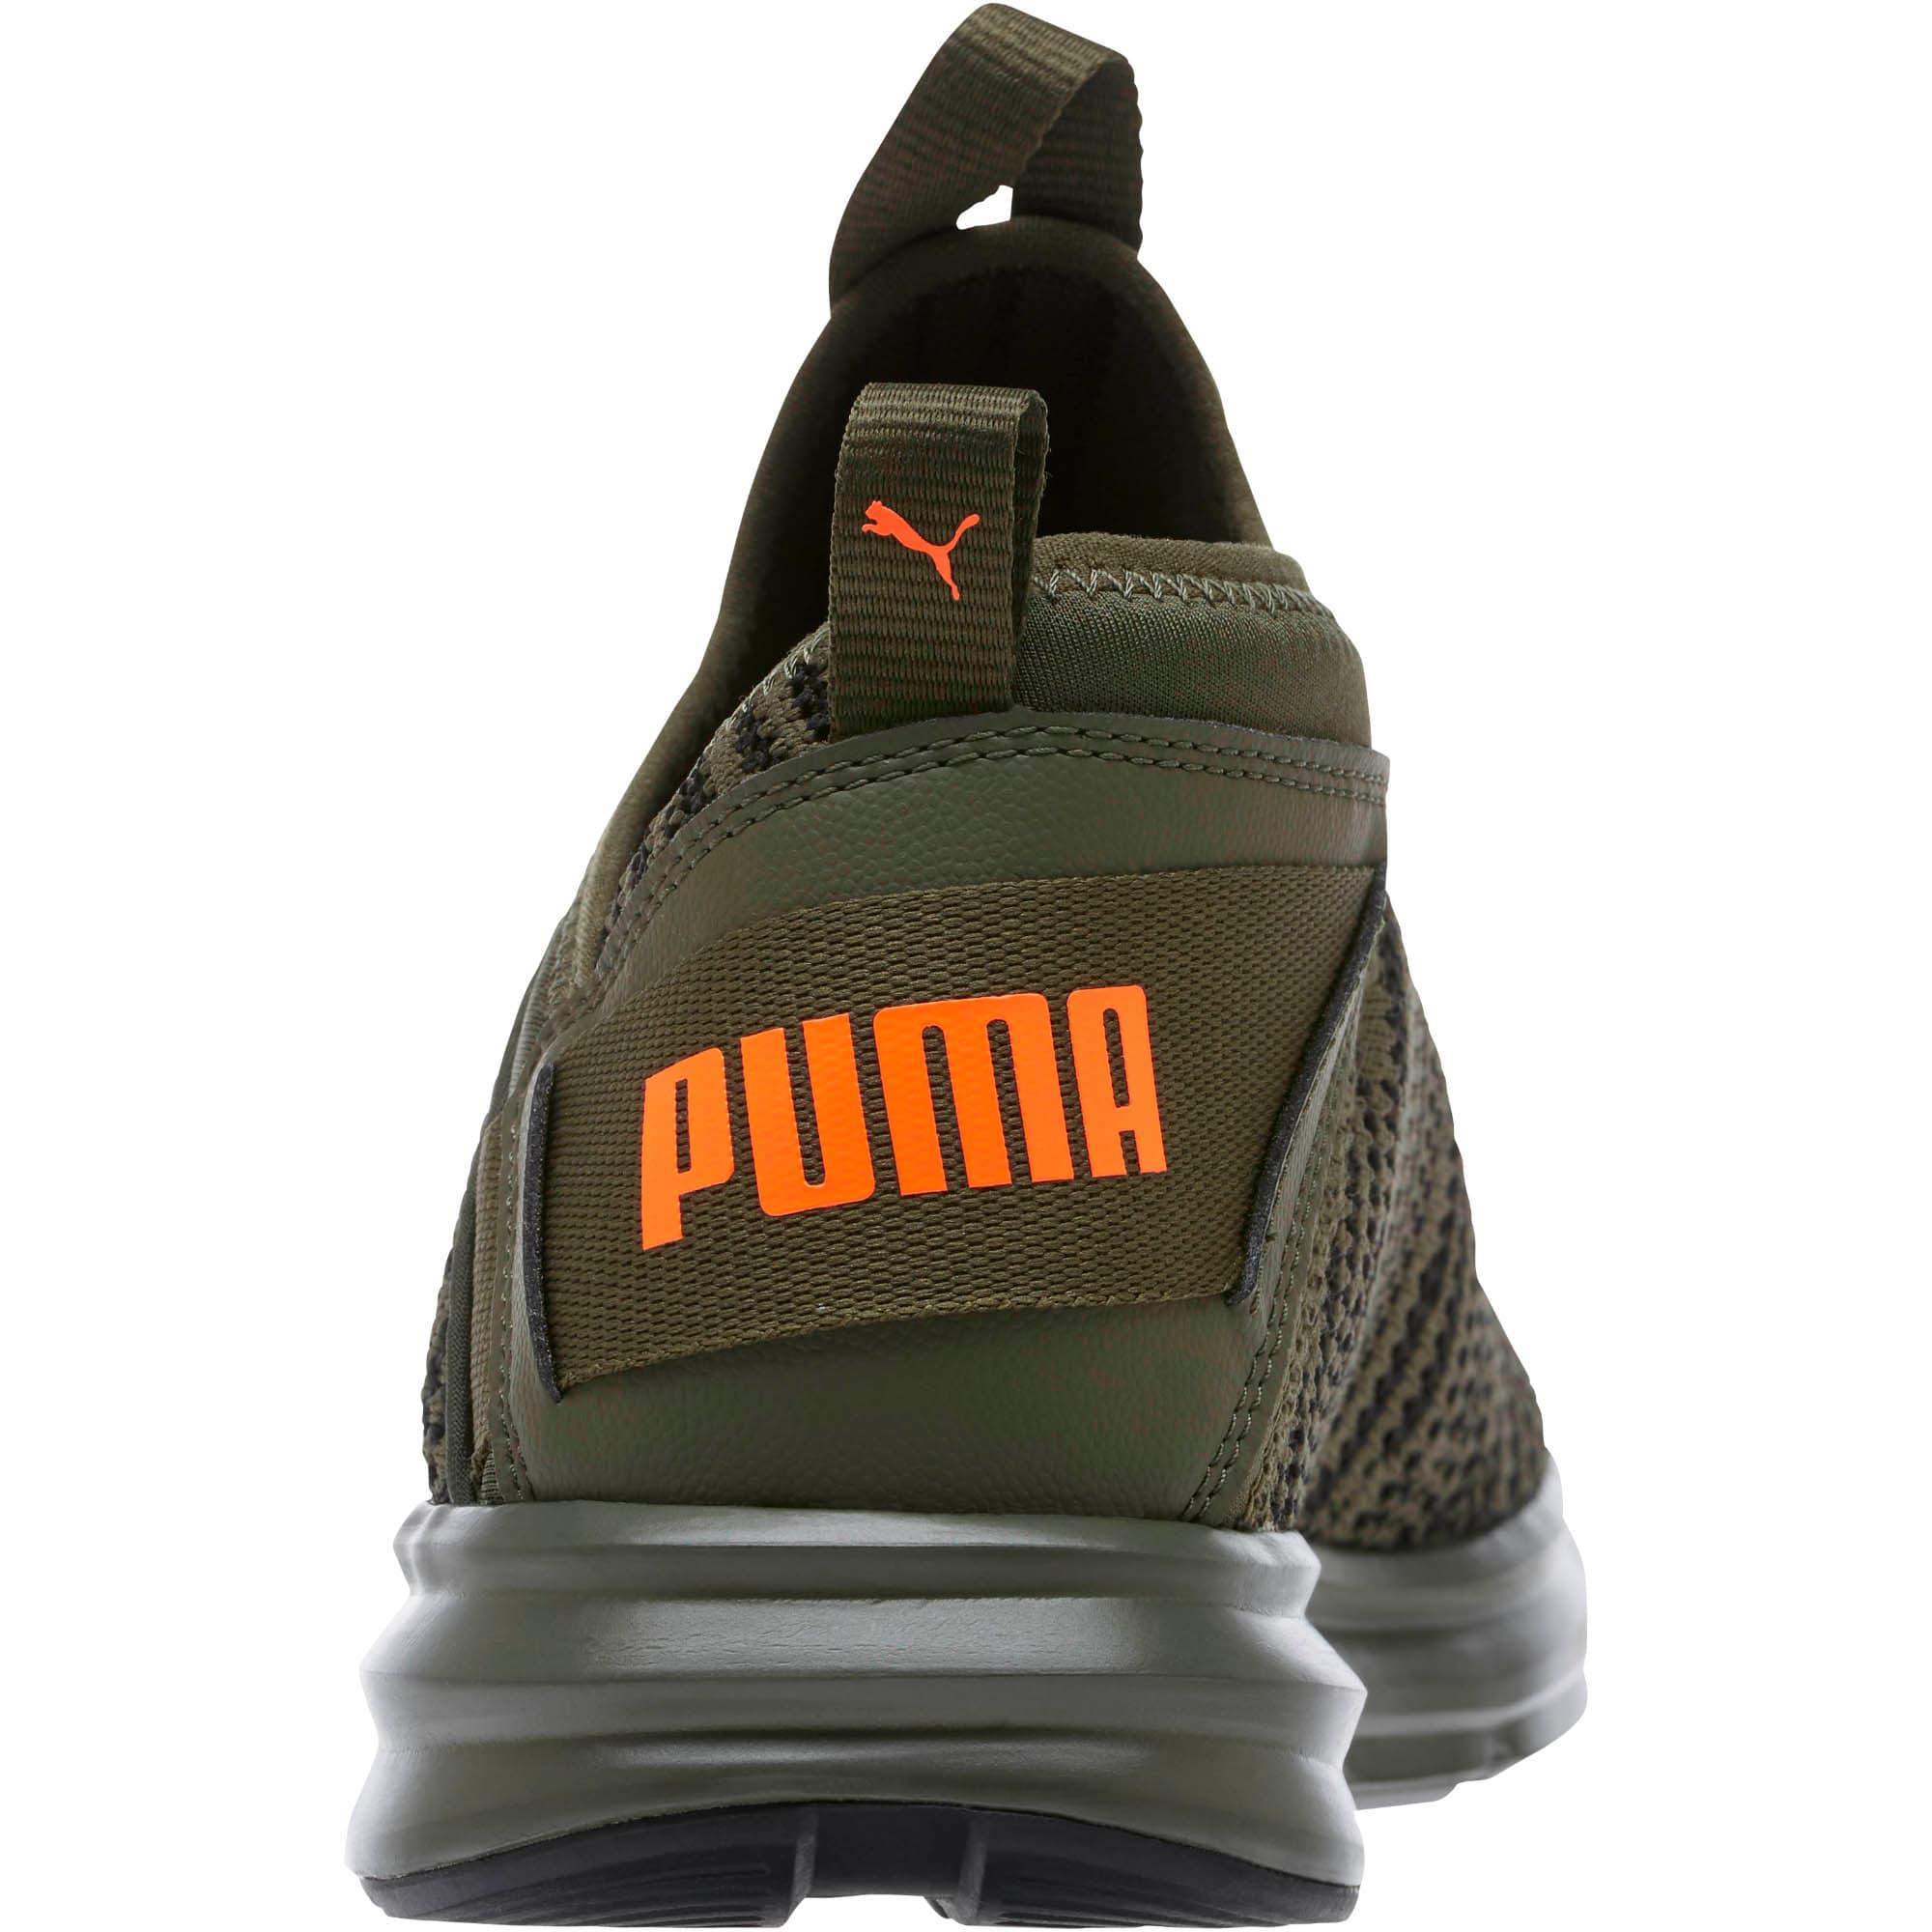 Thumbnail 4 of Enzo Peak Men's Sneakers, Forest Night-Black-Orange, medium